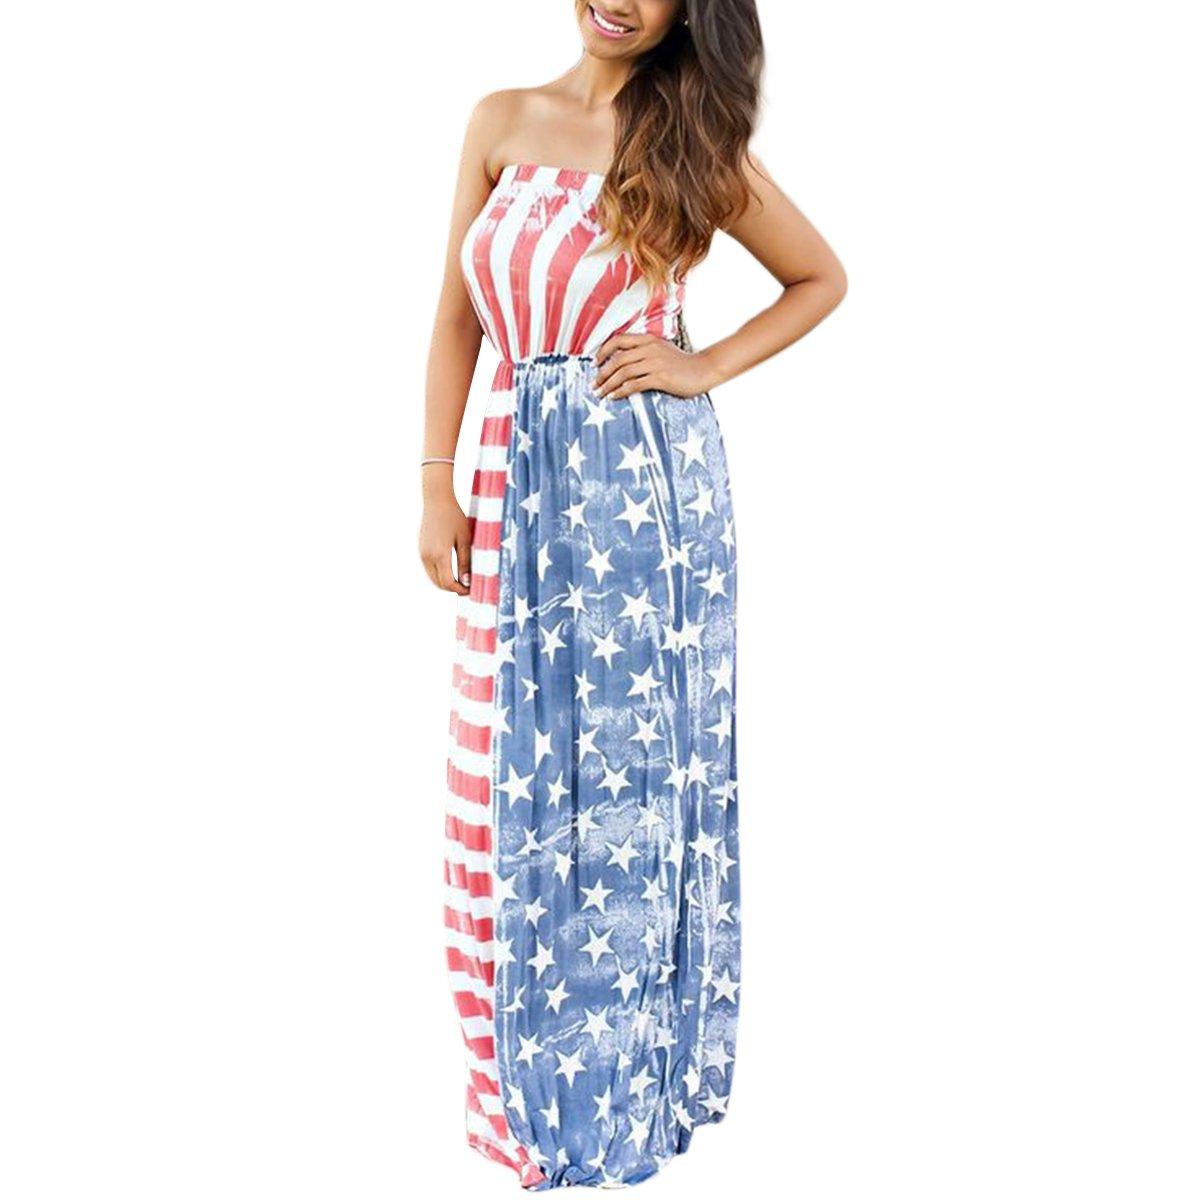 90e7372361e ZMLIA Womens American Flag Print 4th July Patriotic Strapless High Waist  Maxi Dresses at Amazon Women s Clothing store